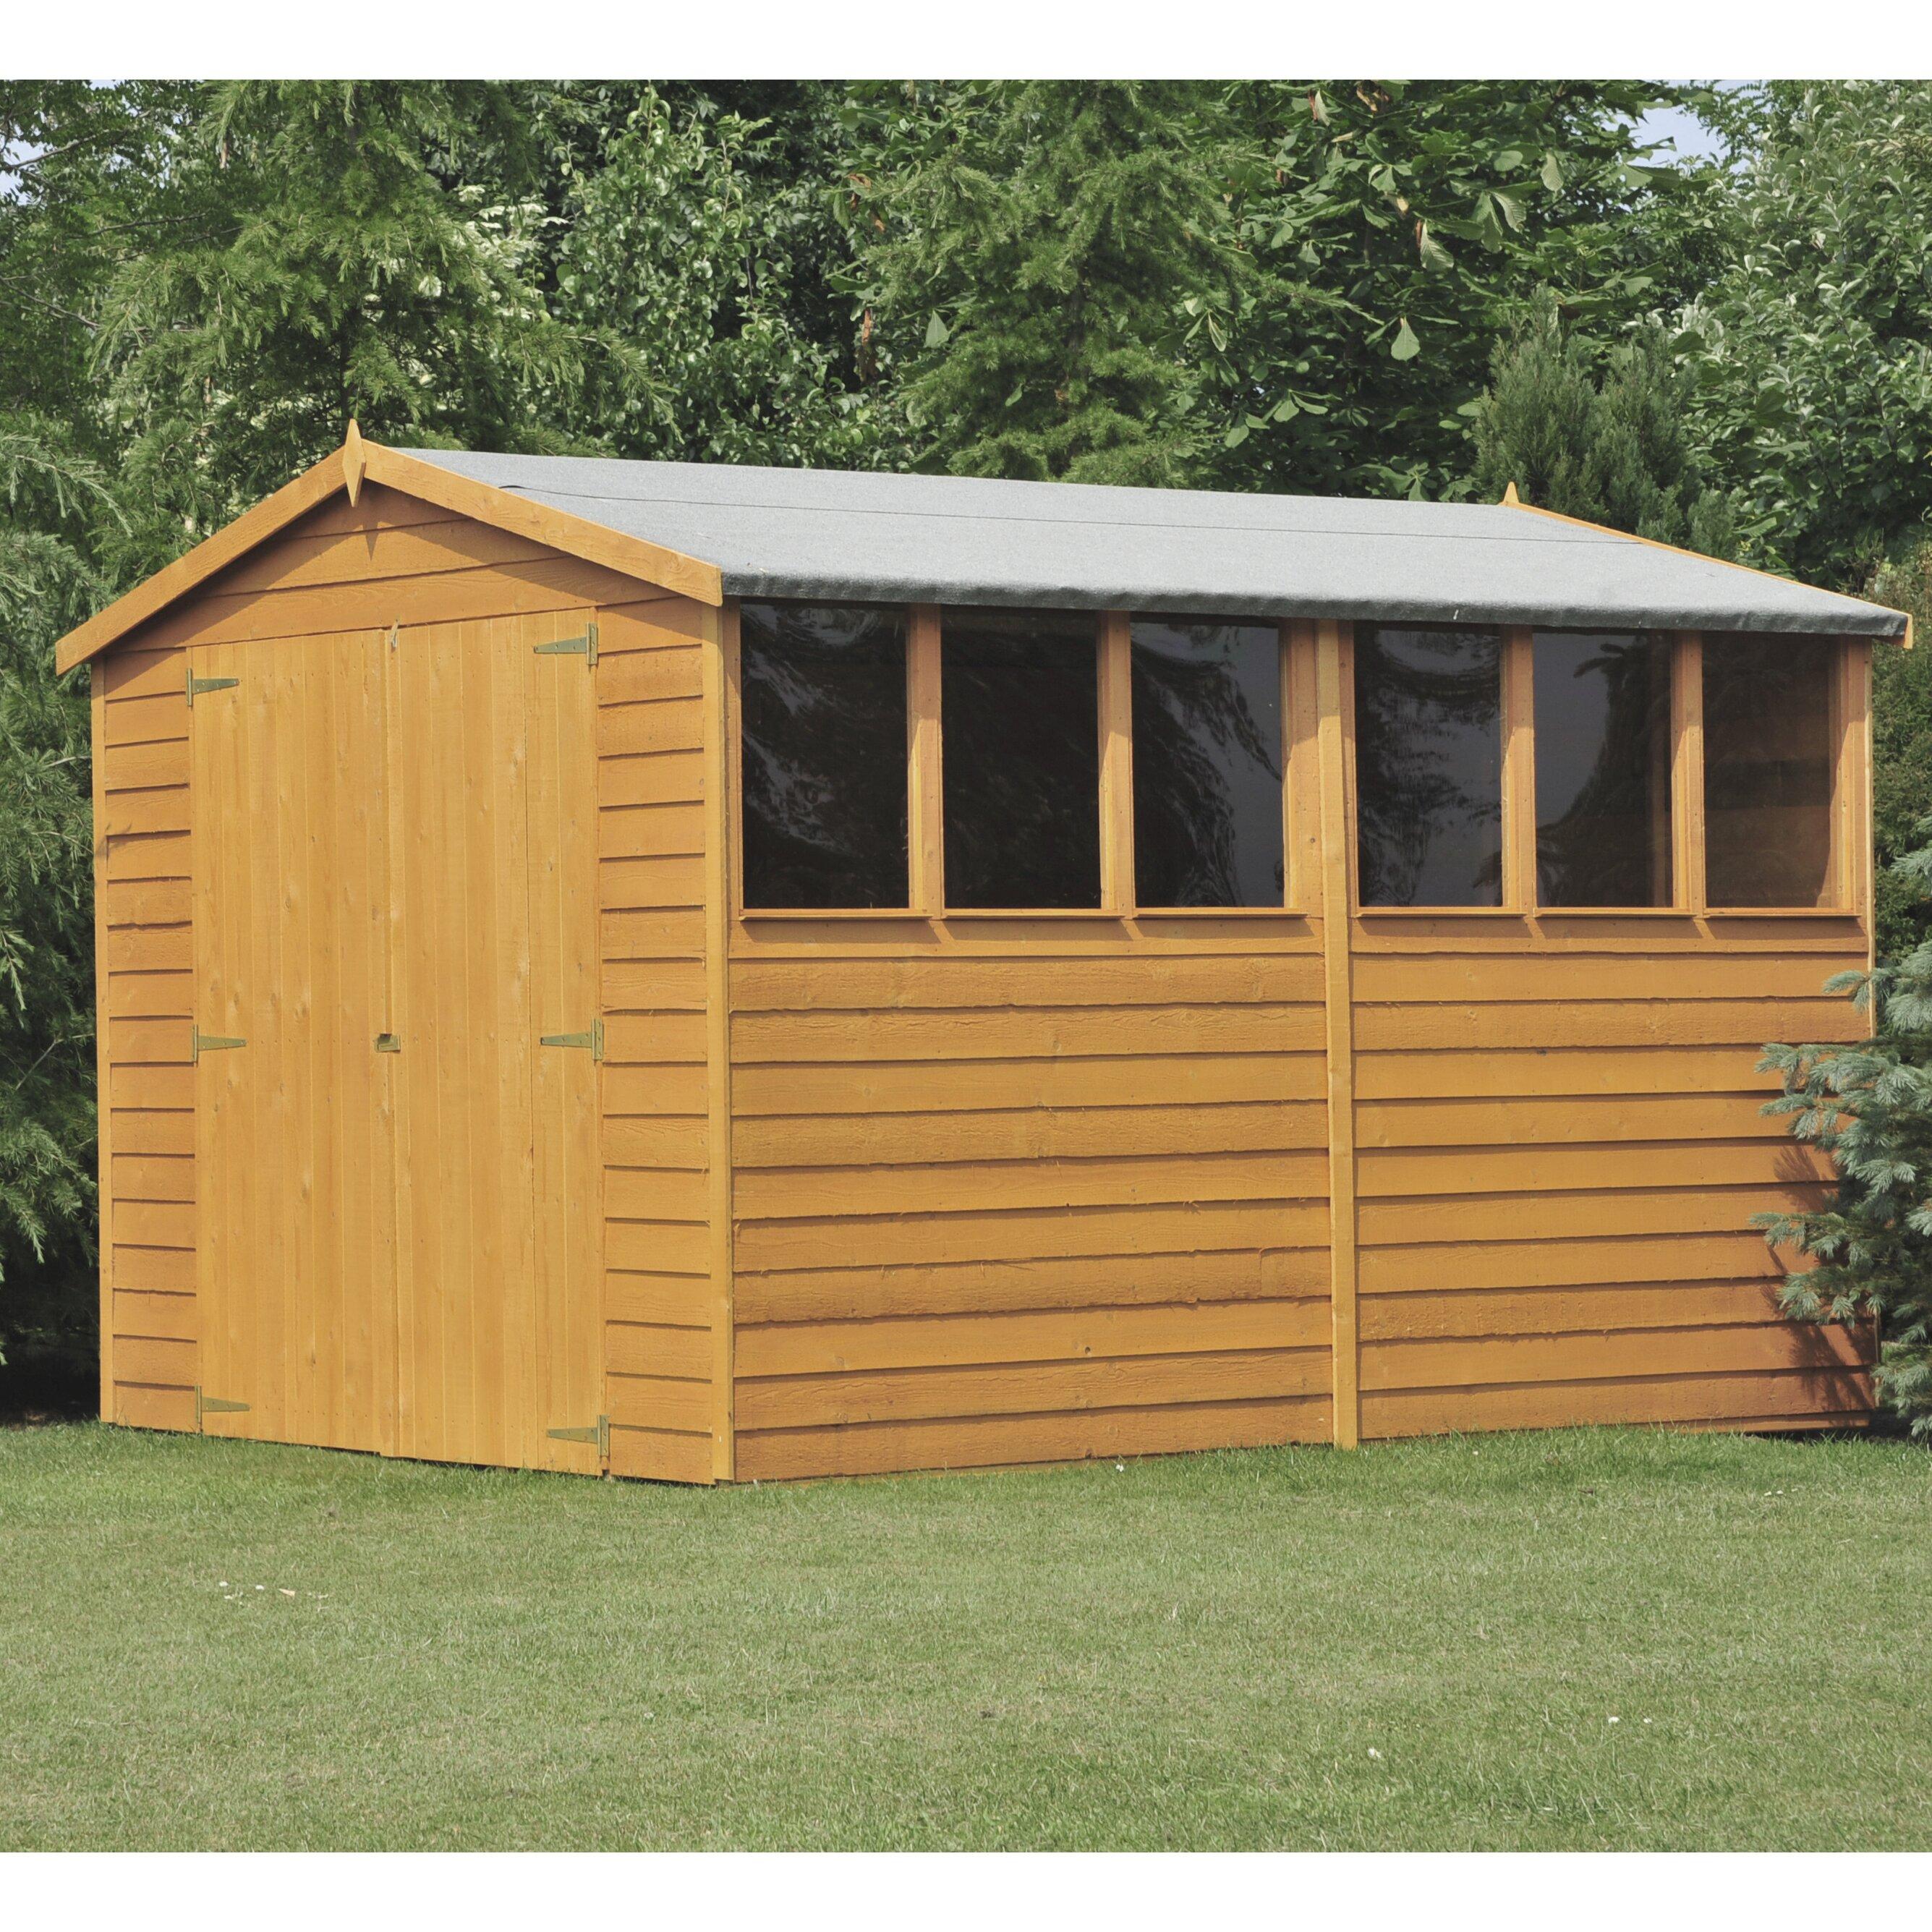 DCor Design 12 X 6 Wooden Storage Shed